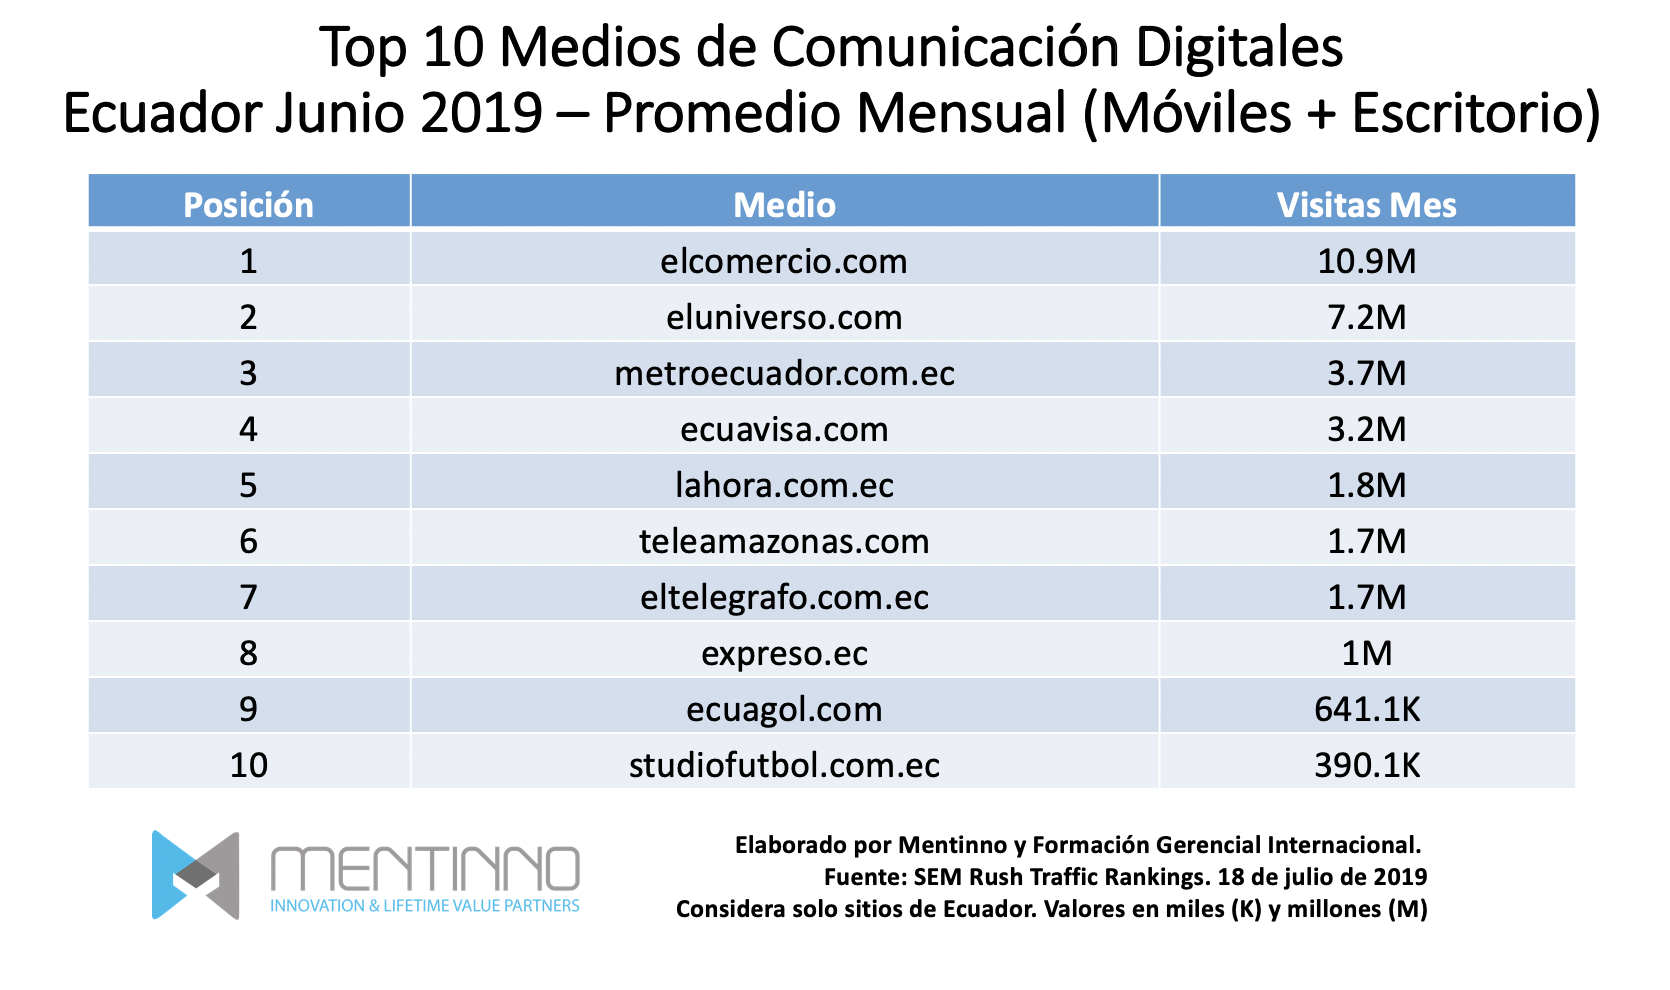 Ranking Digital: Medios de Comunicación en Ecuador 2019